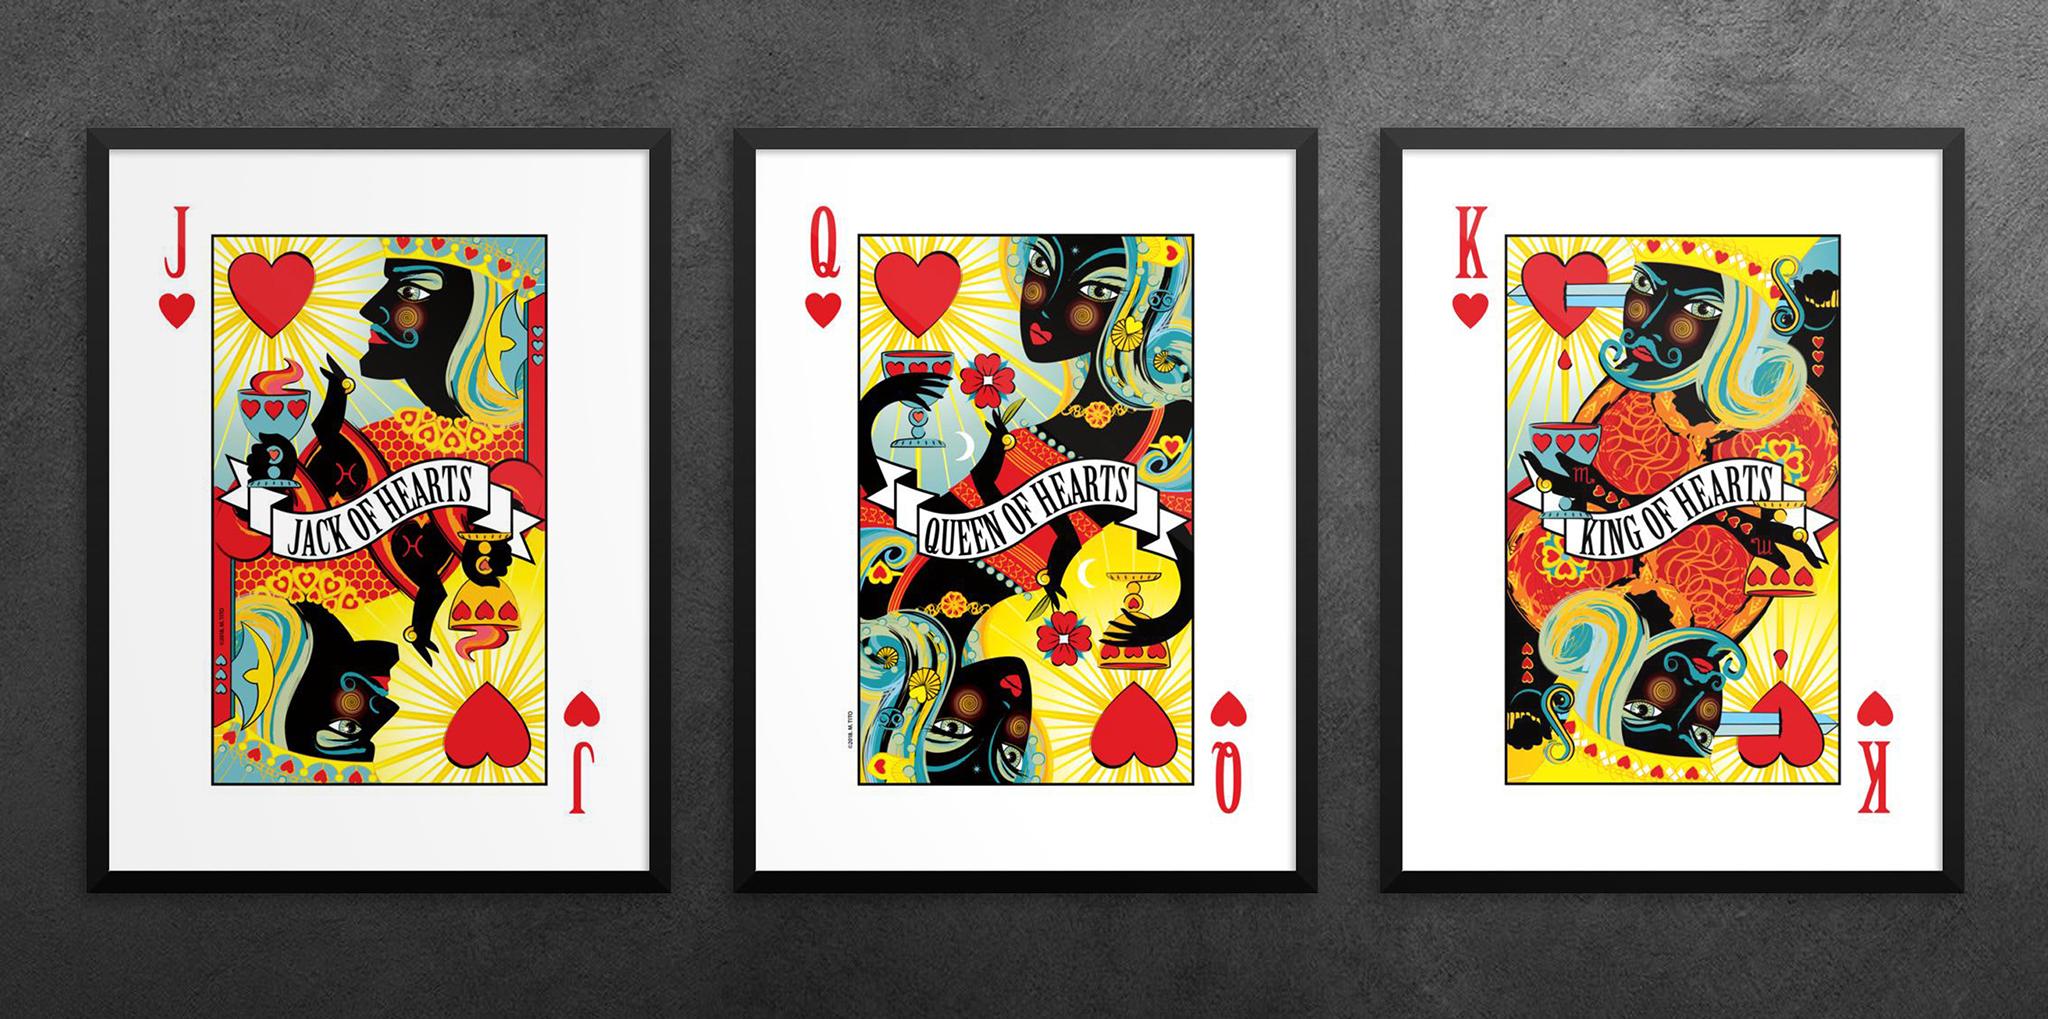 Pocker-Cards-Fine-Art-Prints.jpg